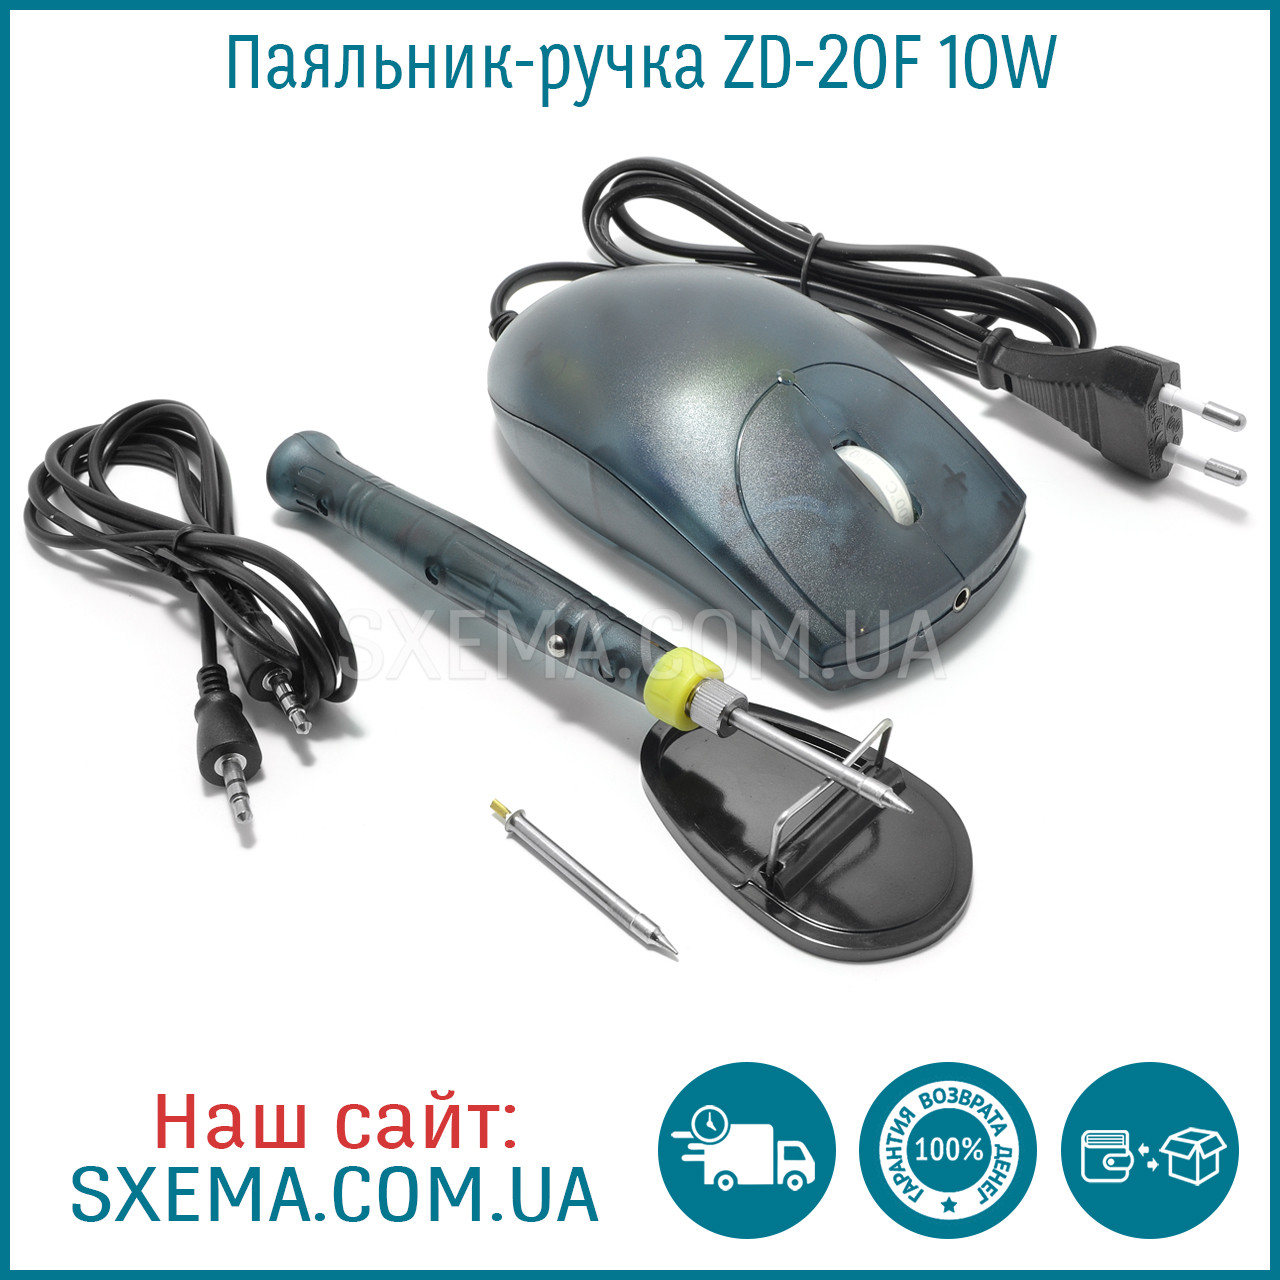 Паяльник-ручка ZD-20F 10W, 220V + жало